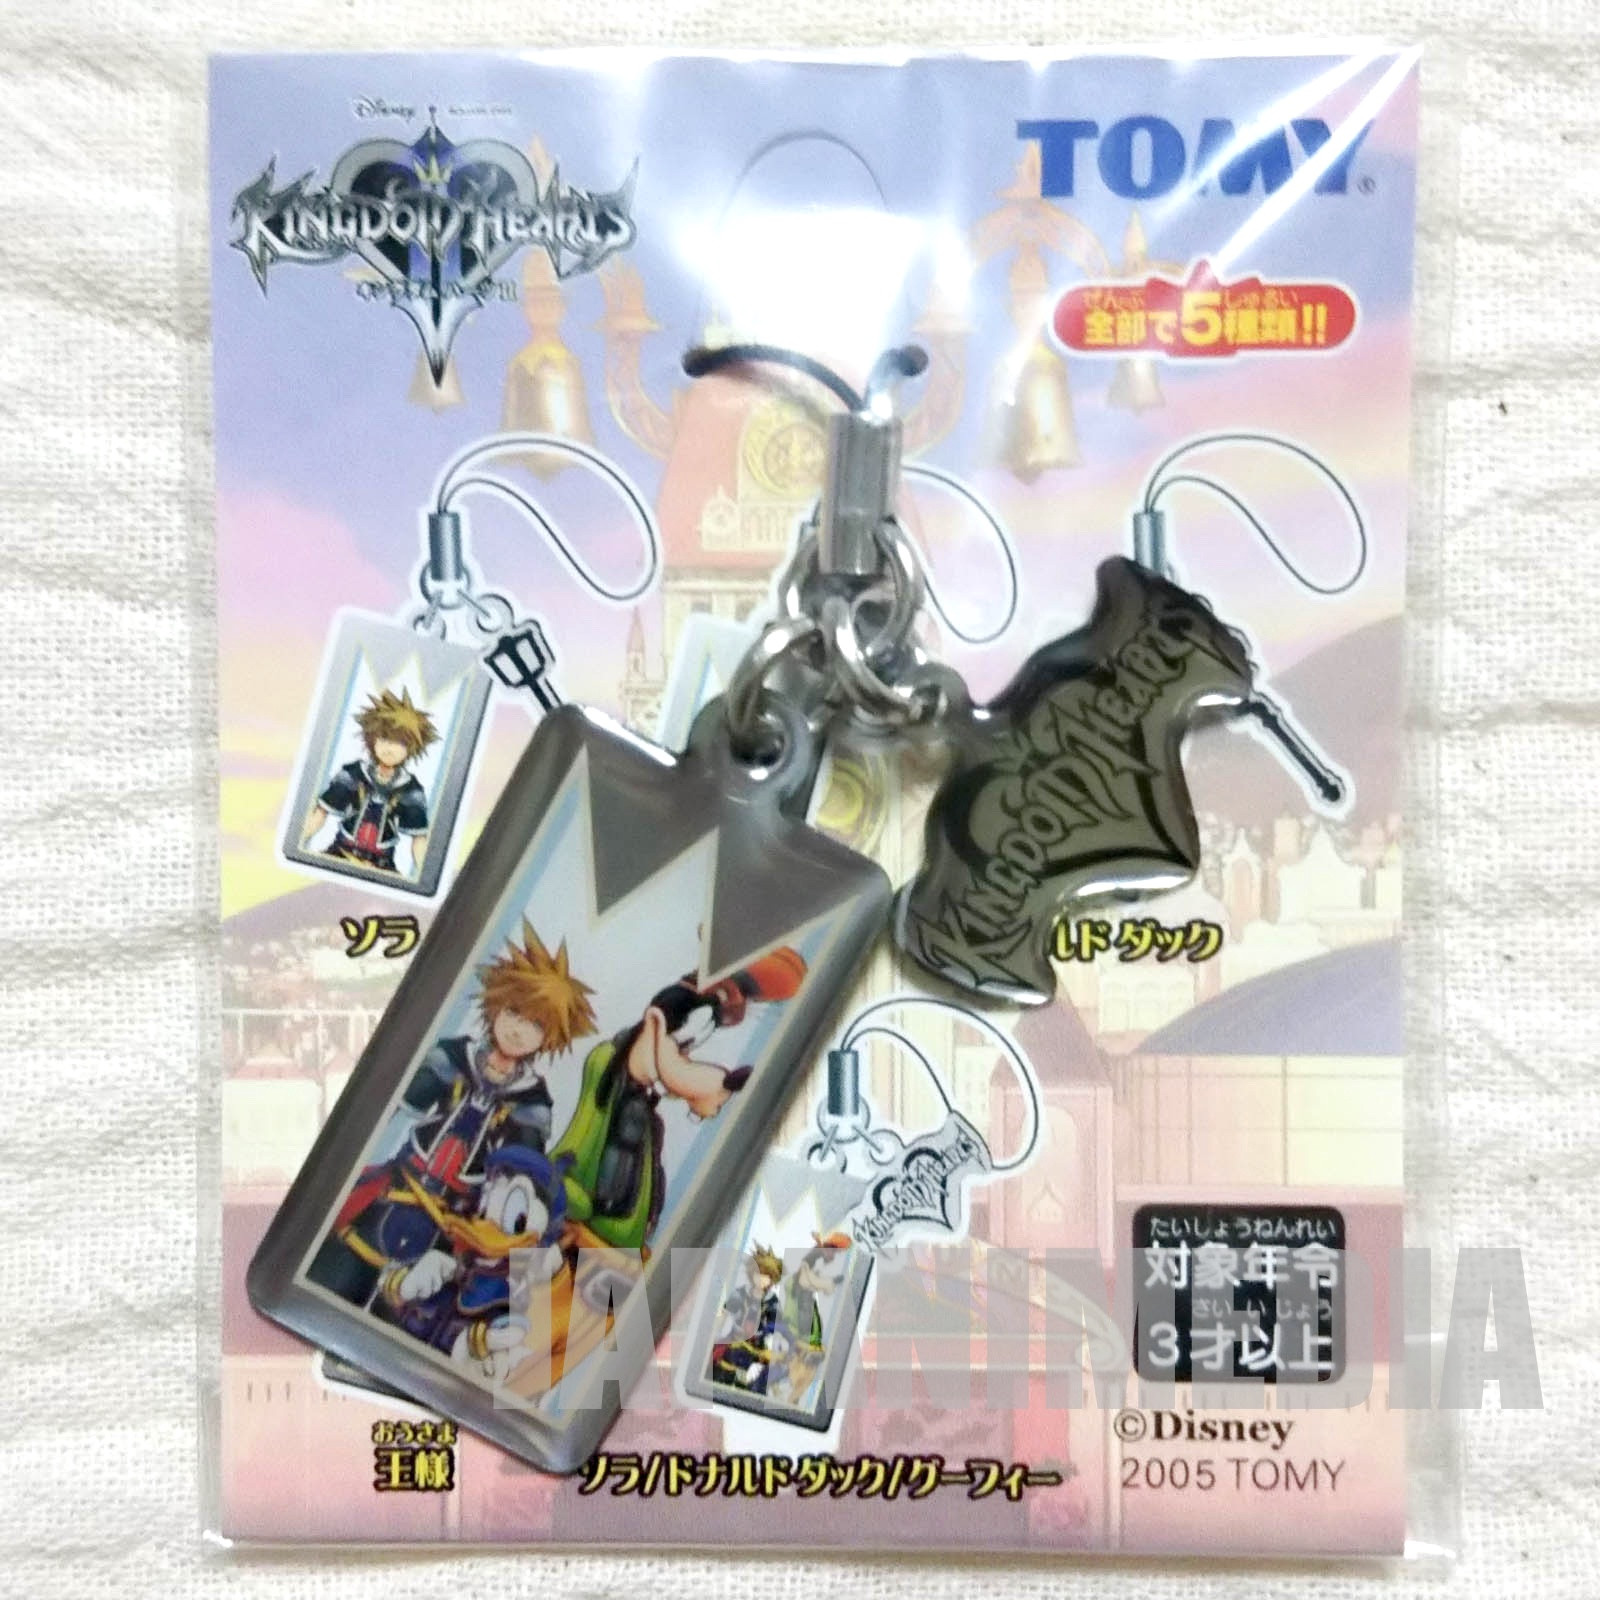 Kingdom Hearts 2 Sora & Donald Duck & Goofy Charm Strap Square Enix JAPAN GAME